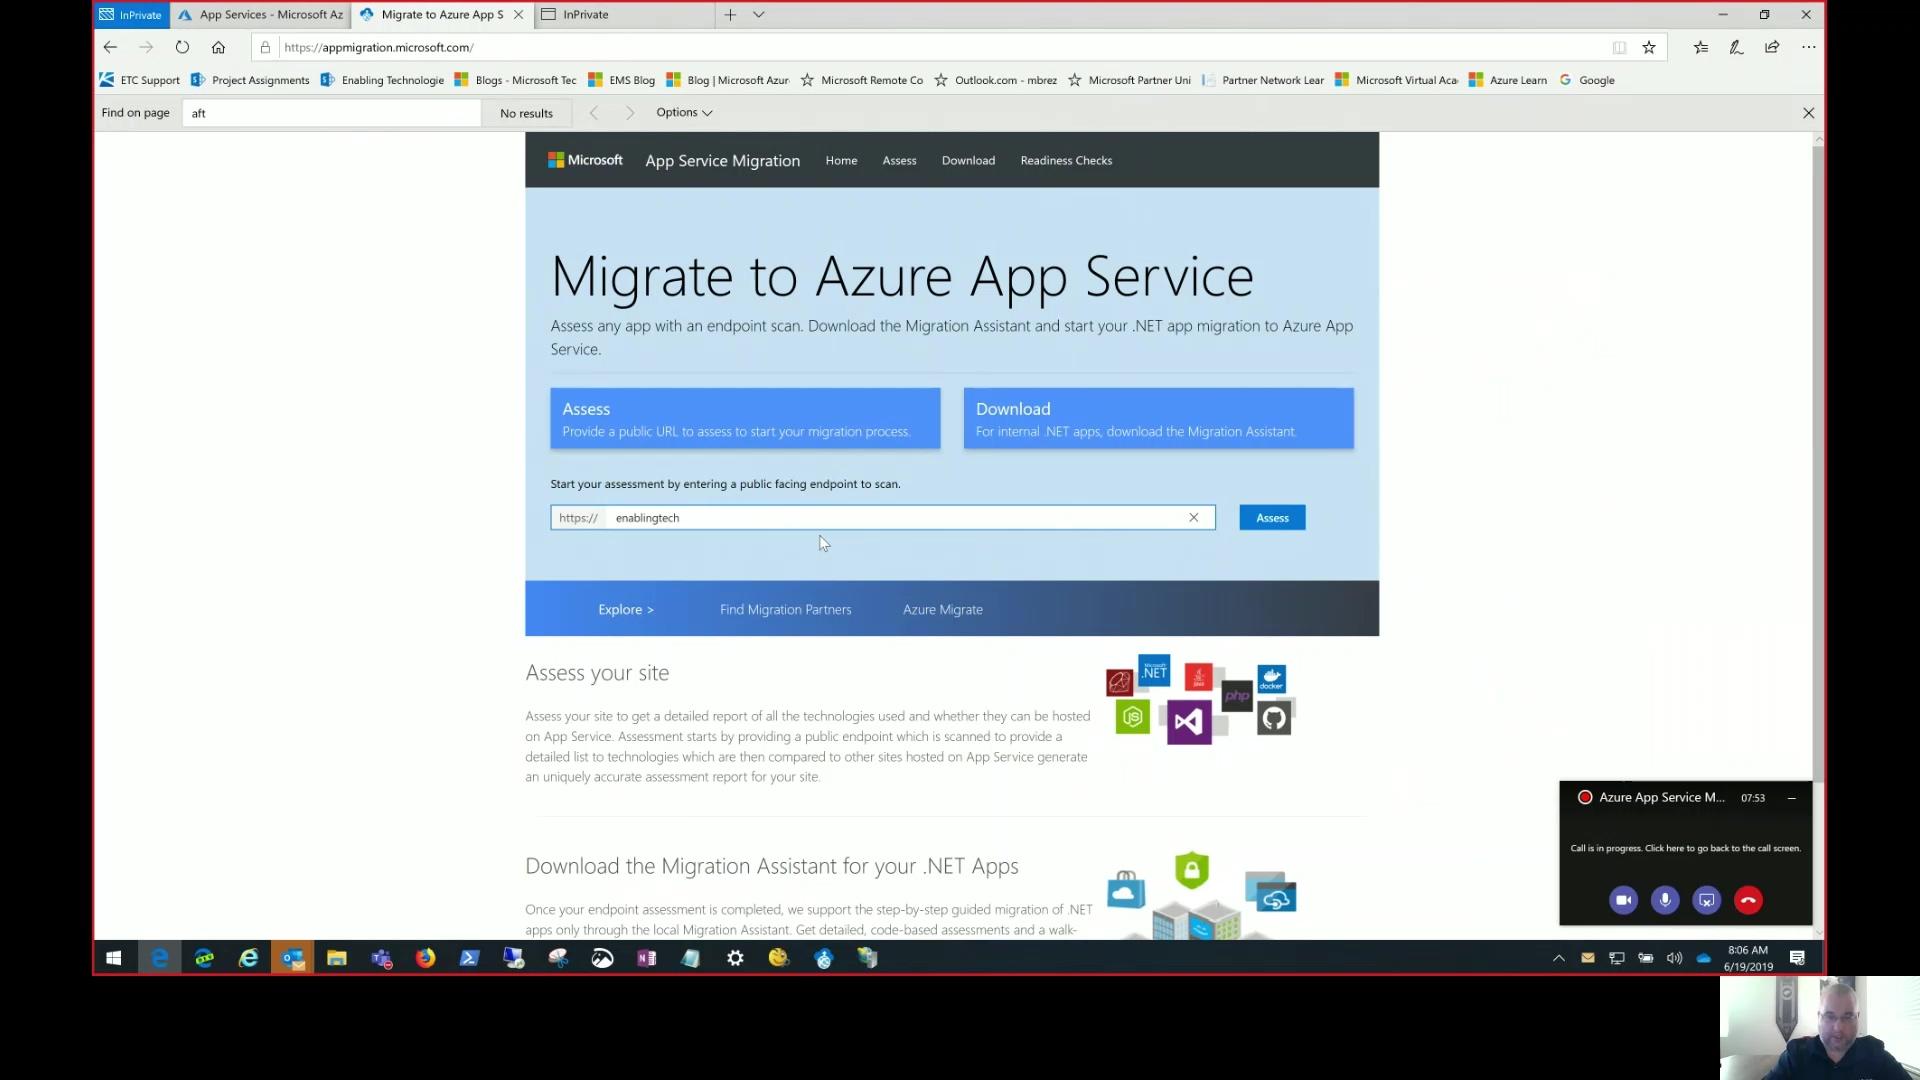 Azure App Service Migration